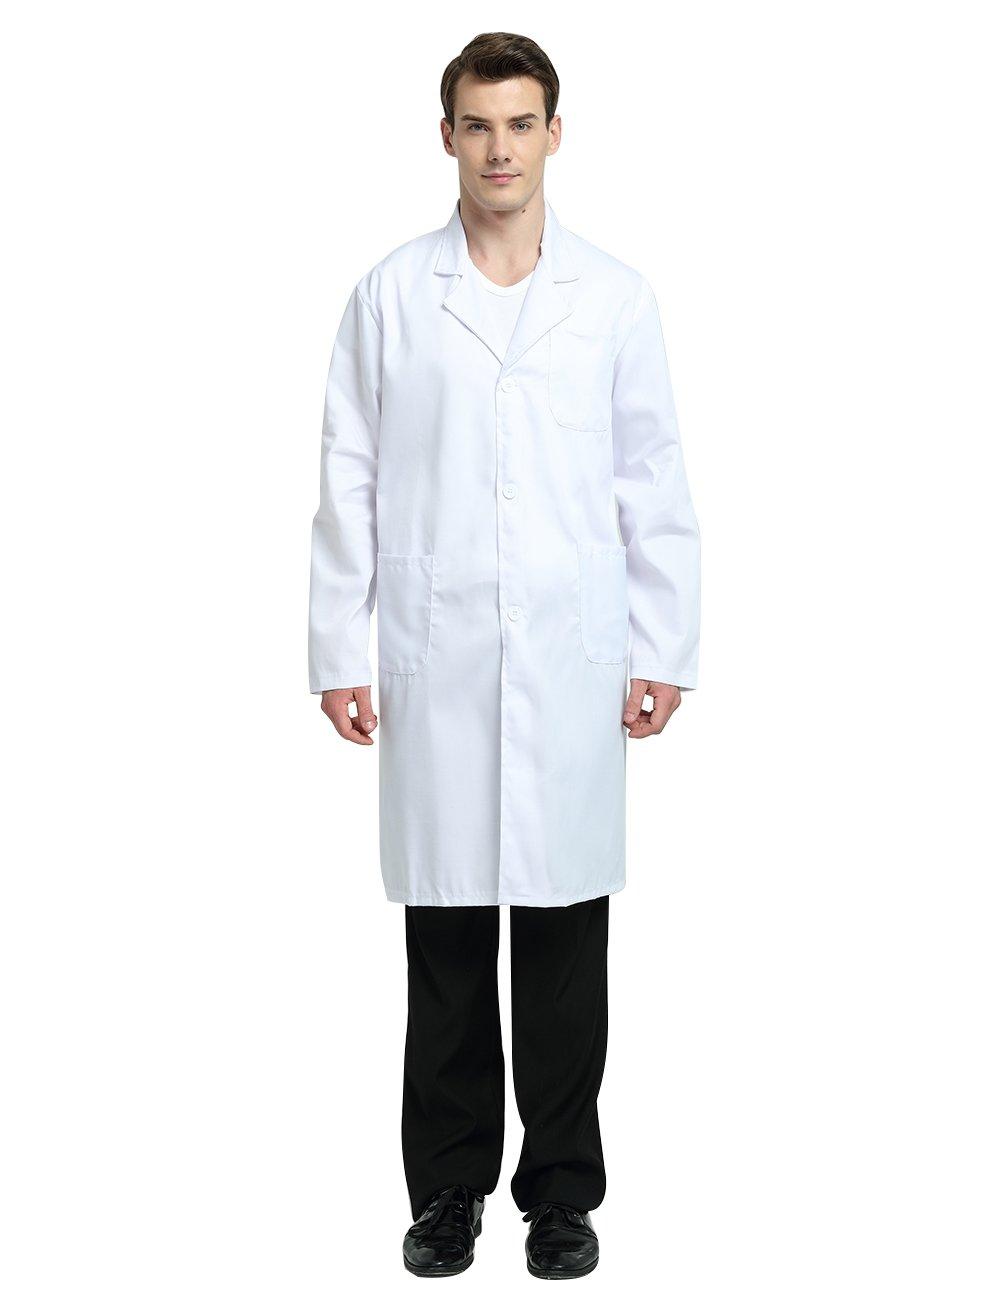 TopTie Everyday Scrubs Unisex Lab Coat-White-US S